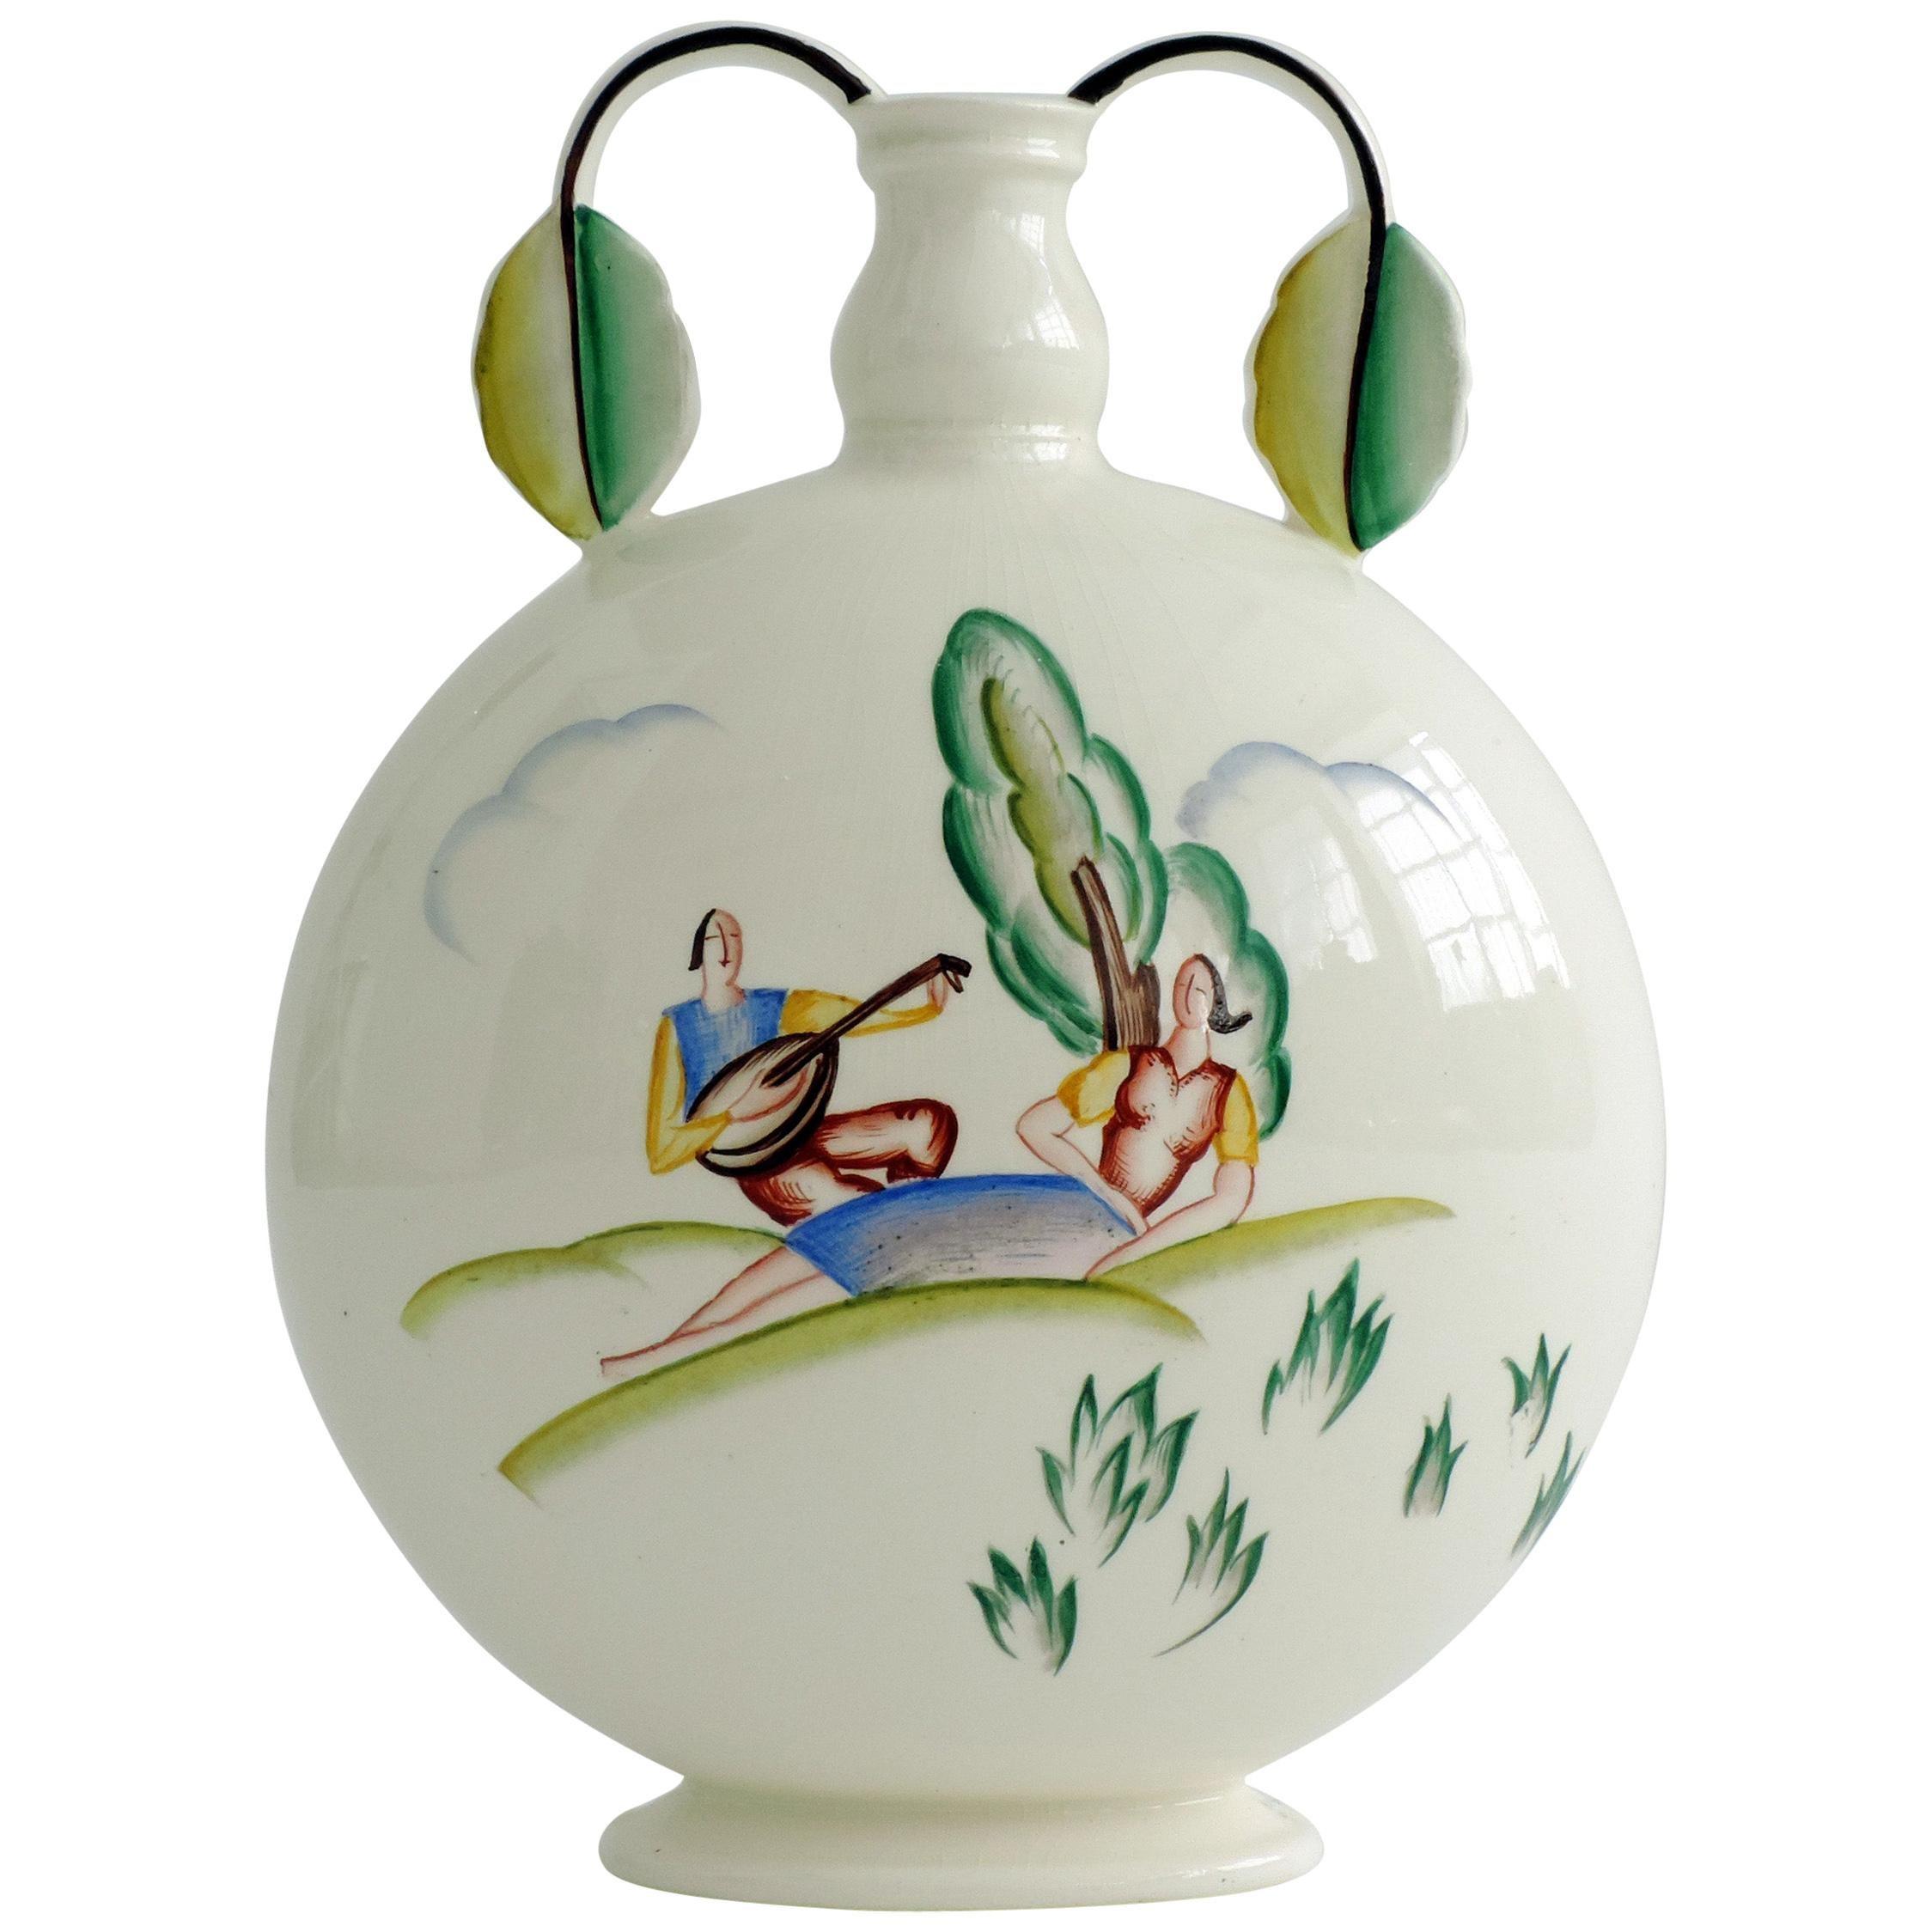 Art Deco Guido Andlovitz Ceramic Vase for S.C.I Laveno, Italy, 1940s